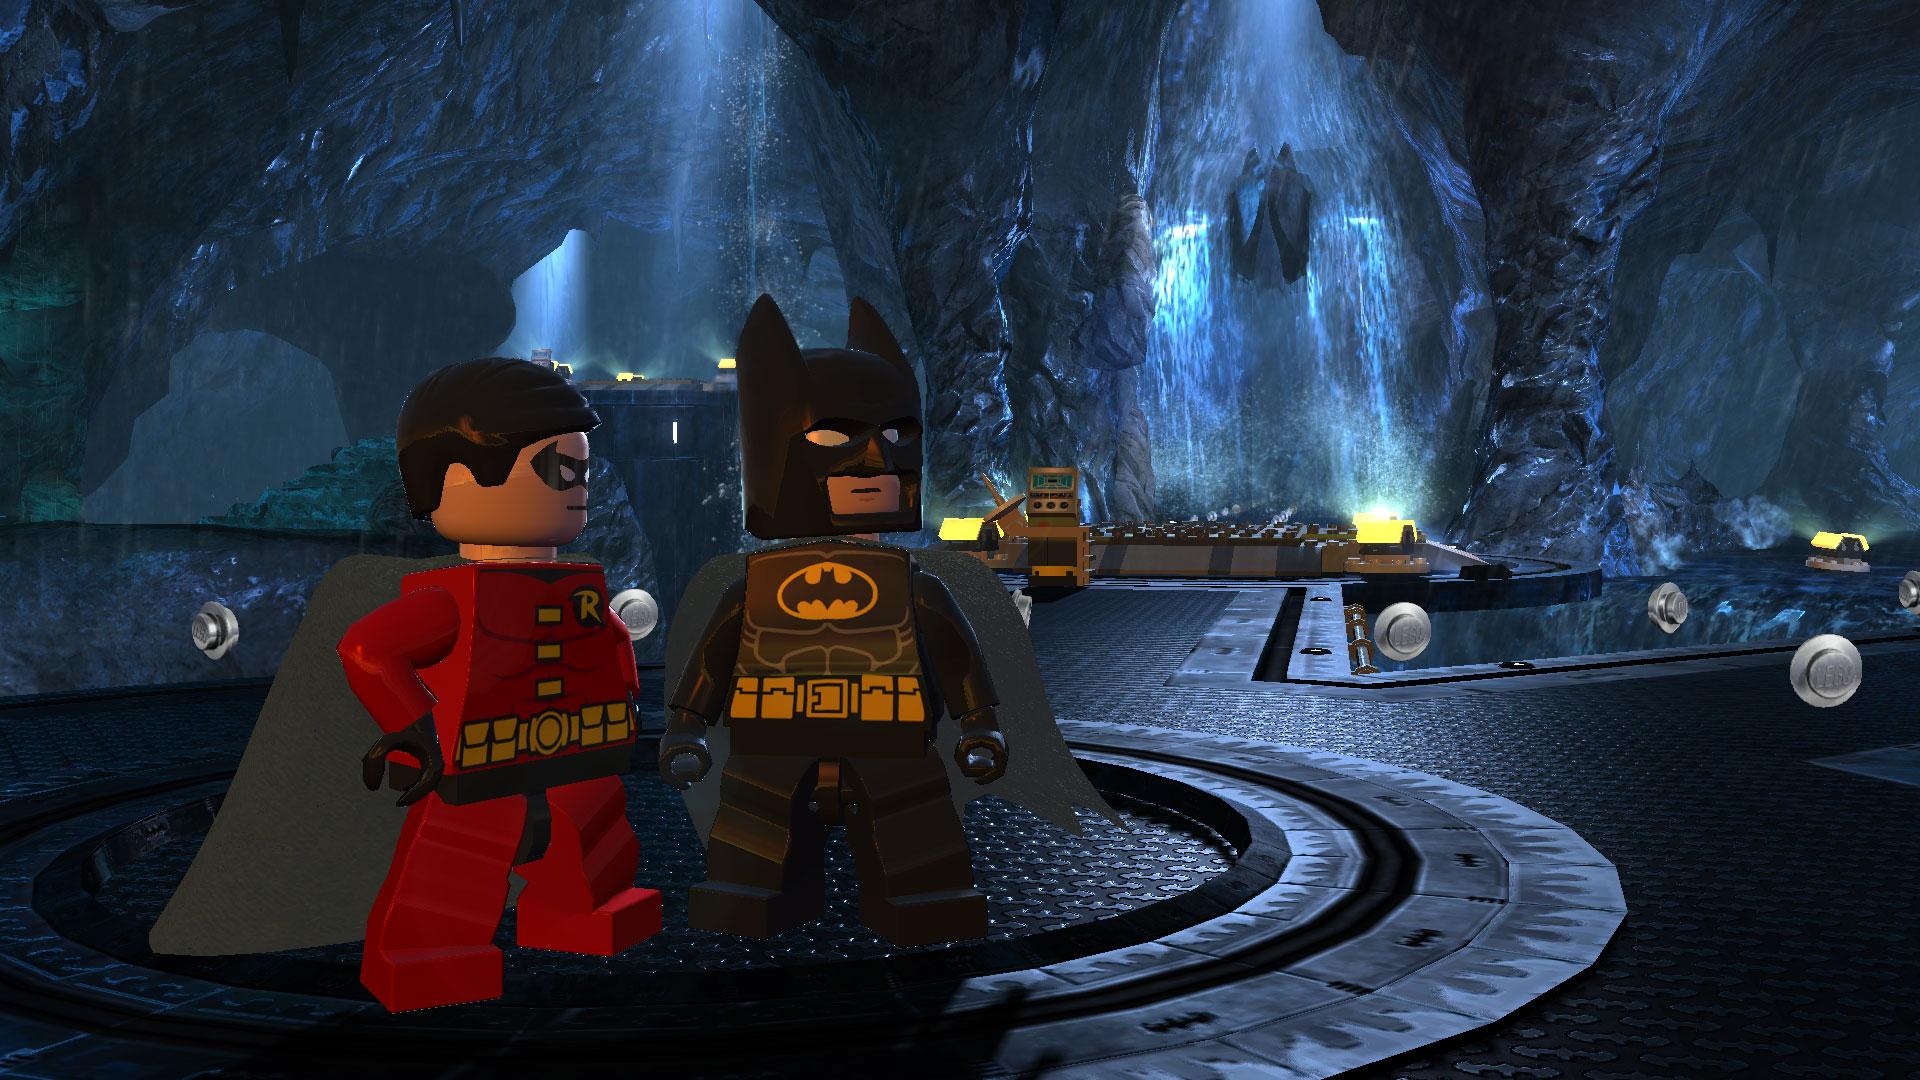 Amazing LEGO Batman 2: DC Super Heroes Pictures & Backgrounds